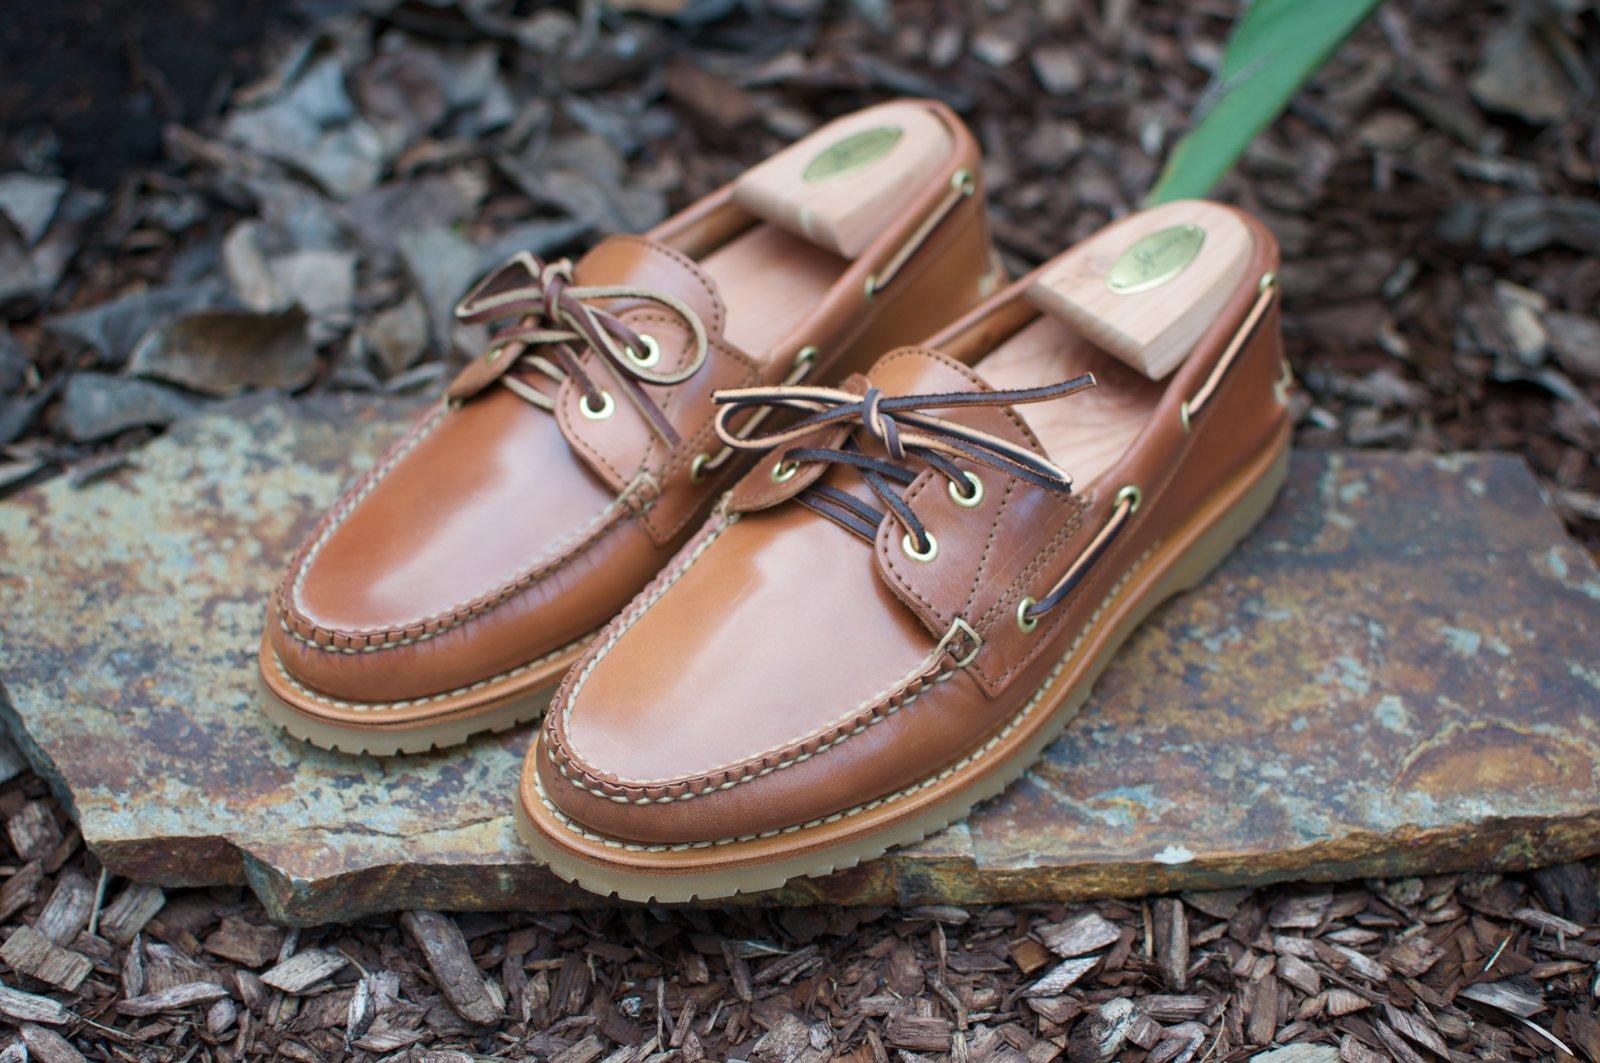 Rancourt Natty Shell Boat Shoes - 2020-03-24 - 1.jpg